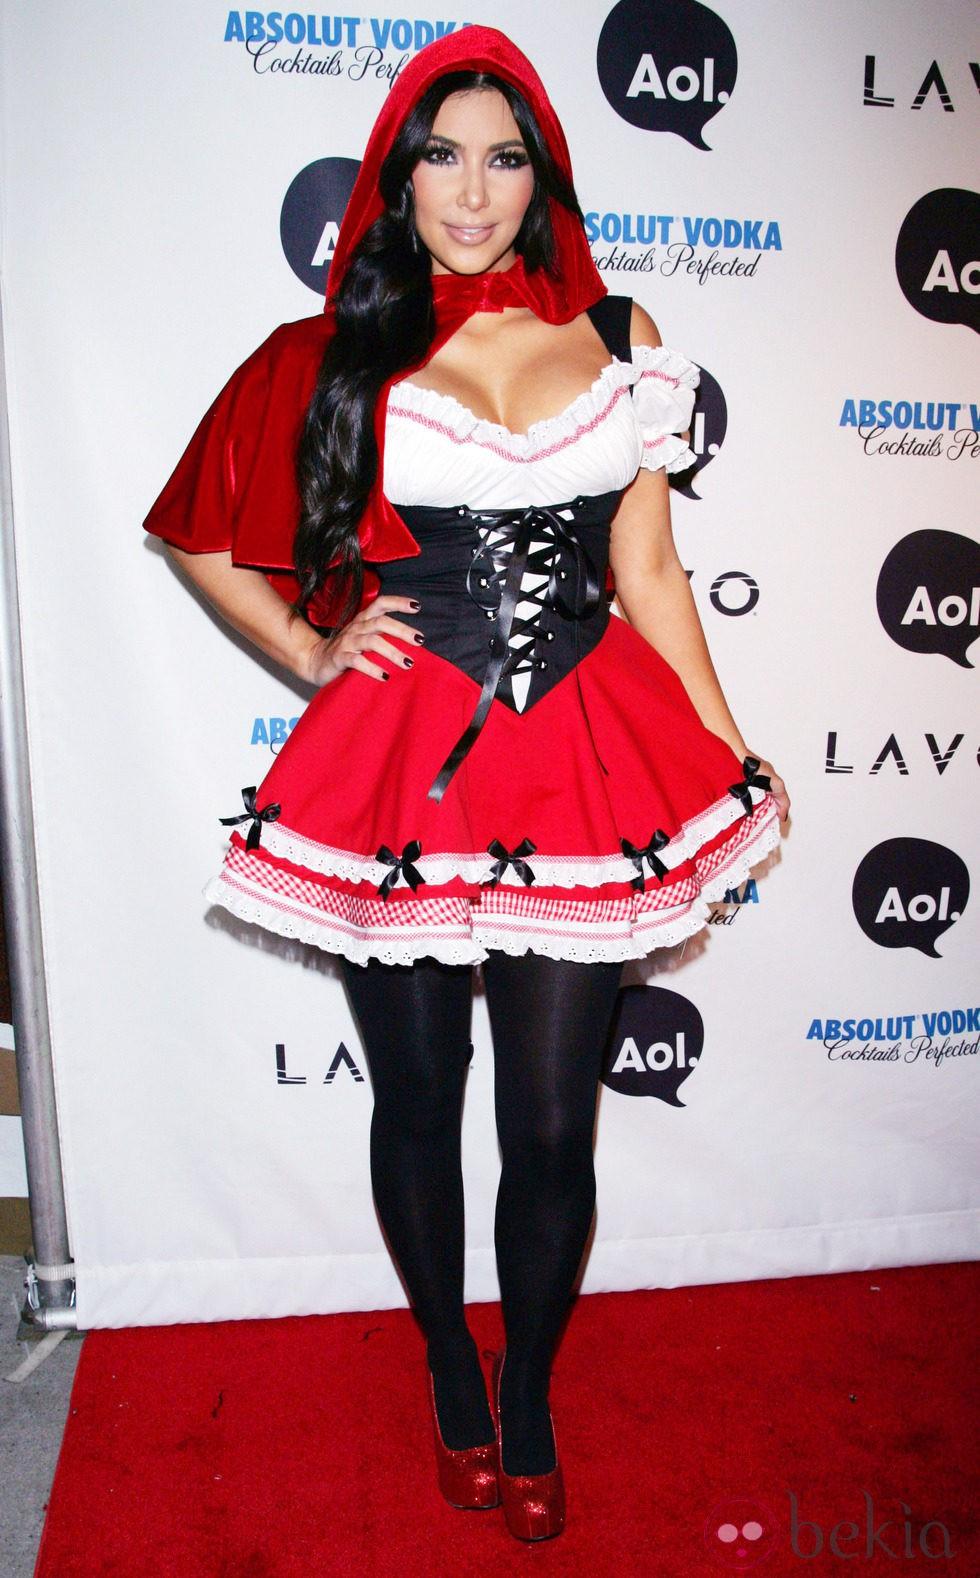 Caperucita Roja Halloween.Maquillaje Caperucita Roja Cool Lucia Pica Makeup